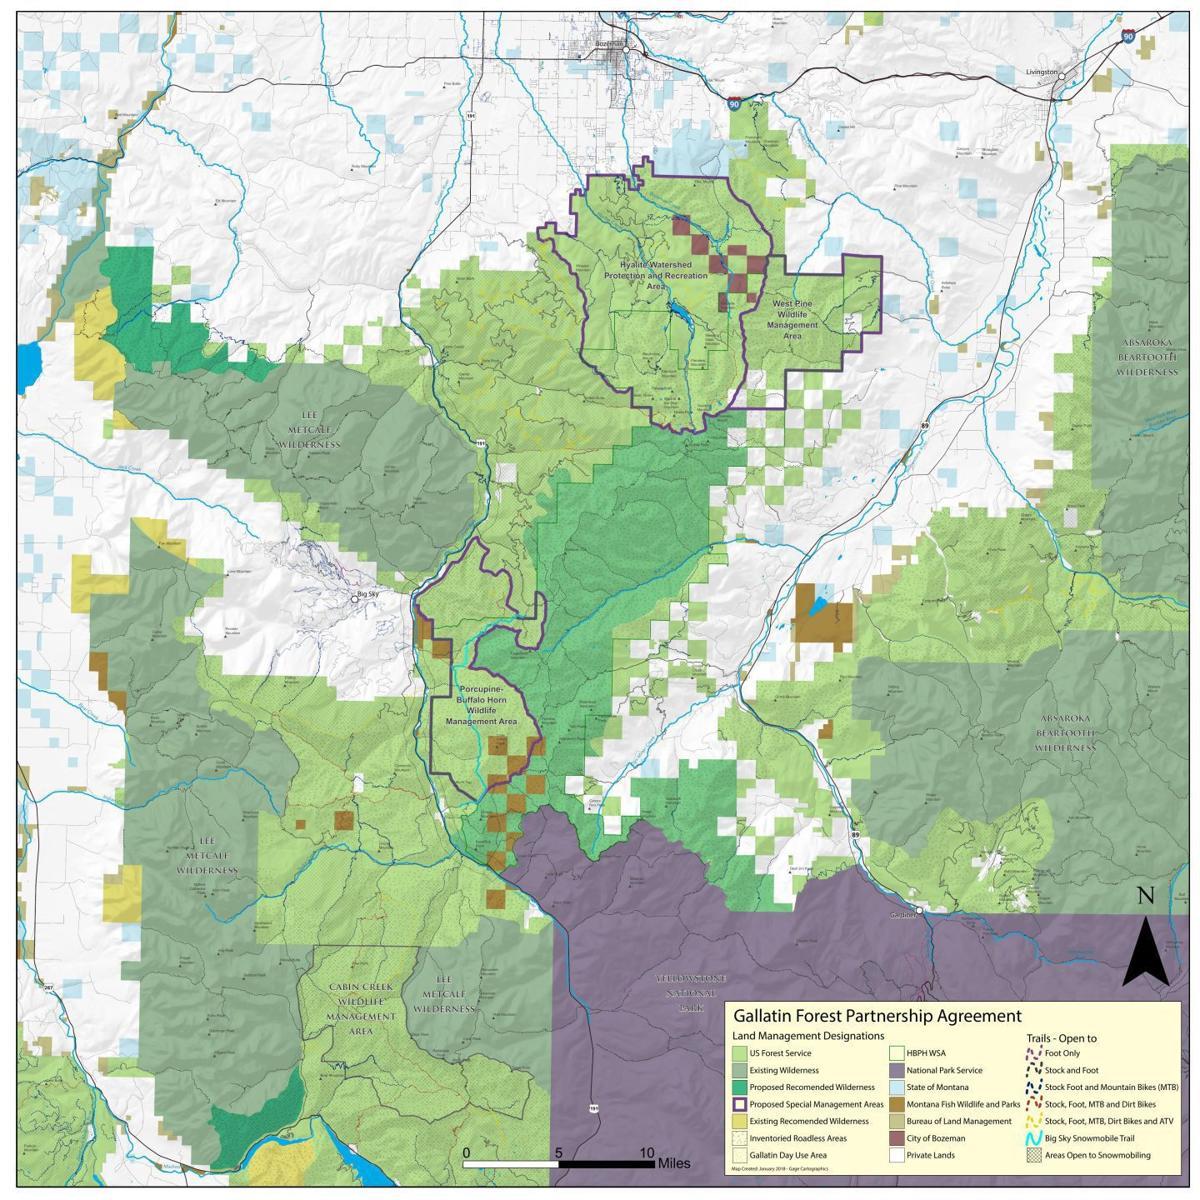 Gallatin Forest Partnership map